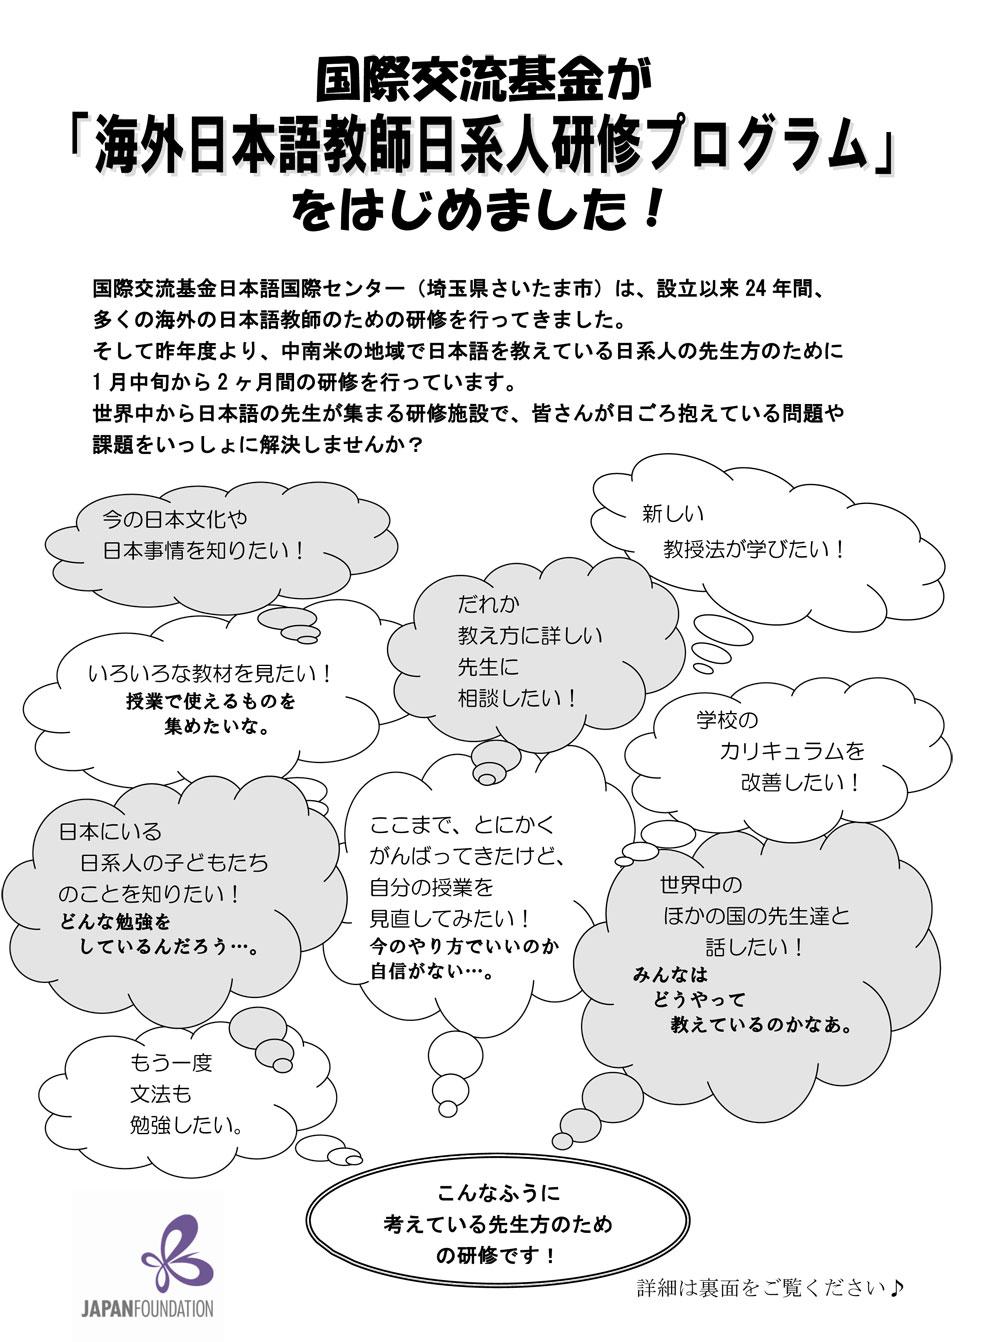 nikkeikenshu_panfleto-1